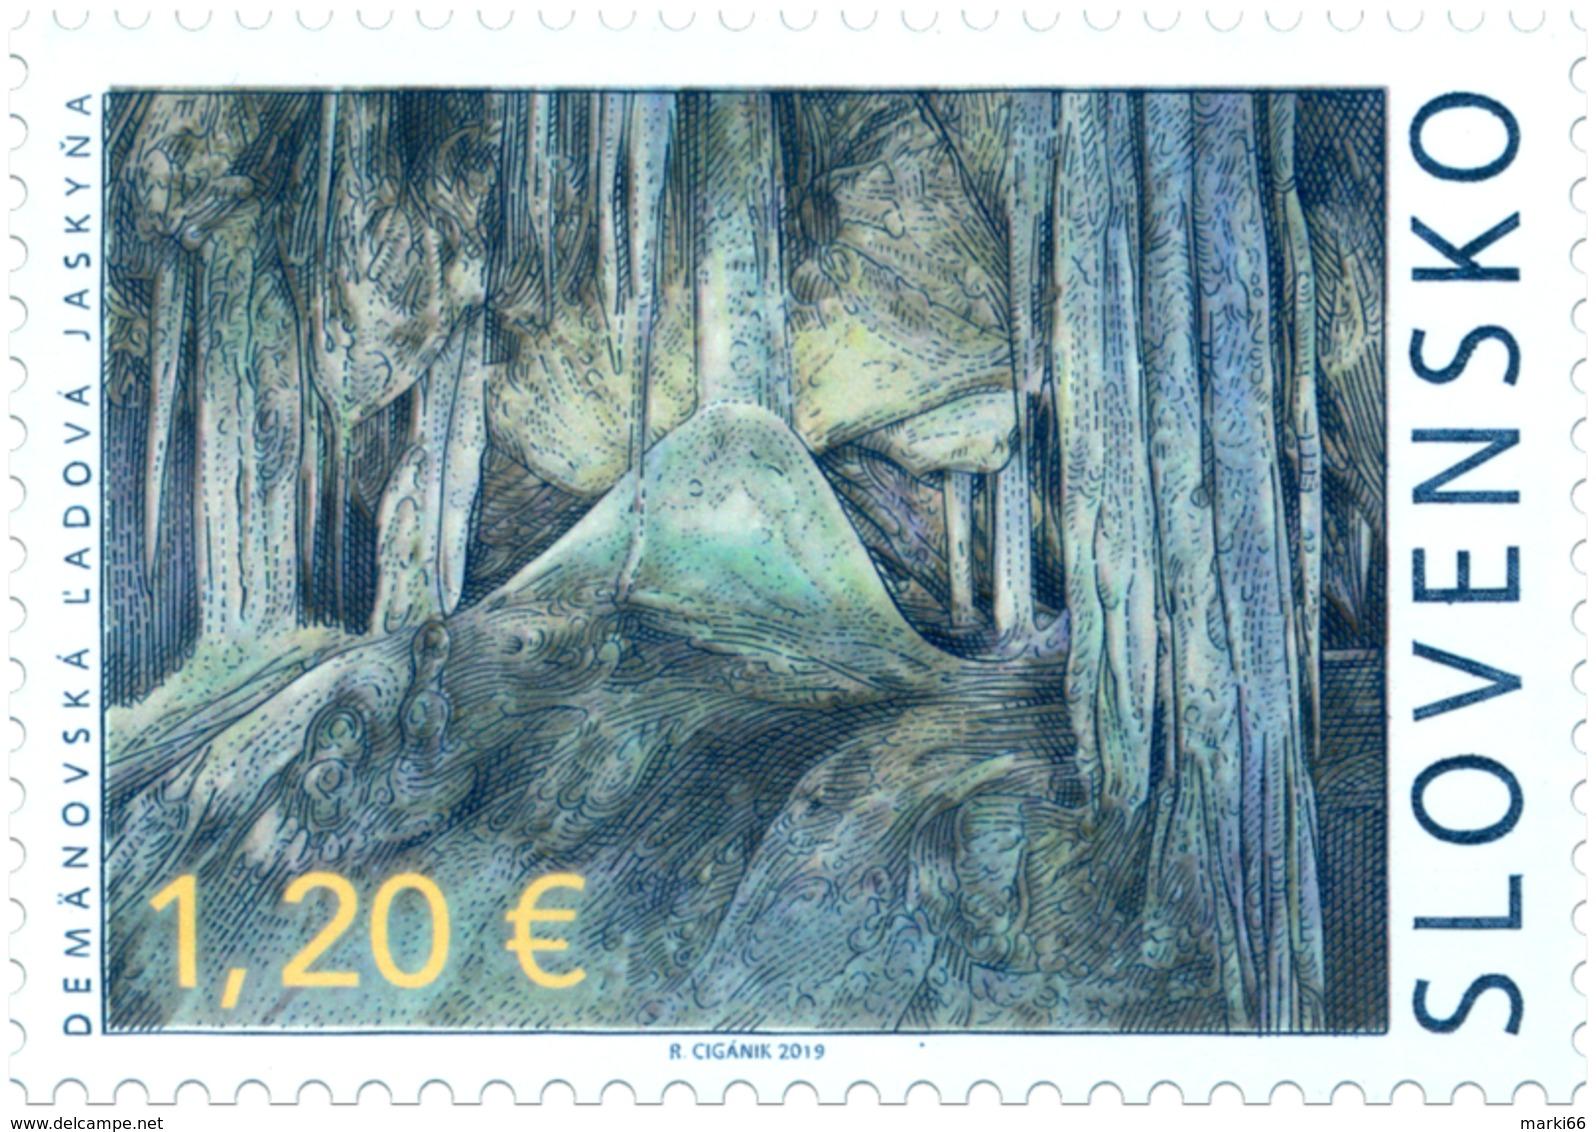 Slovakia - 2019 - Beauties Of Our Homeland - Demänovská Ice Cave - Mint Stamp - Slovacchia